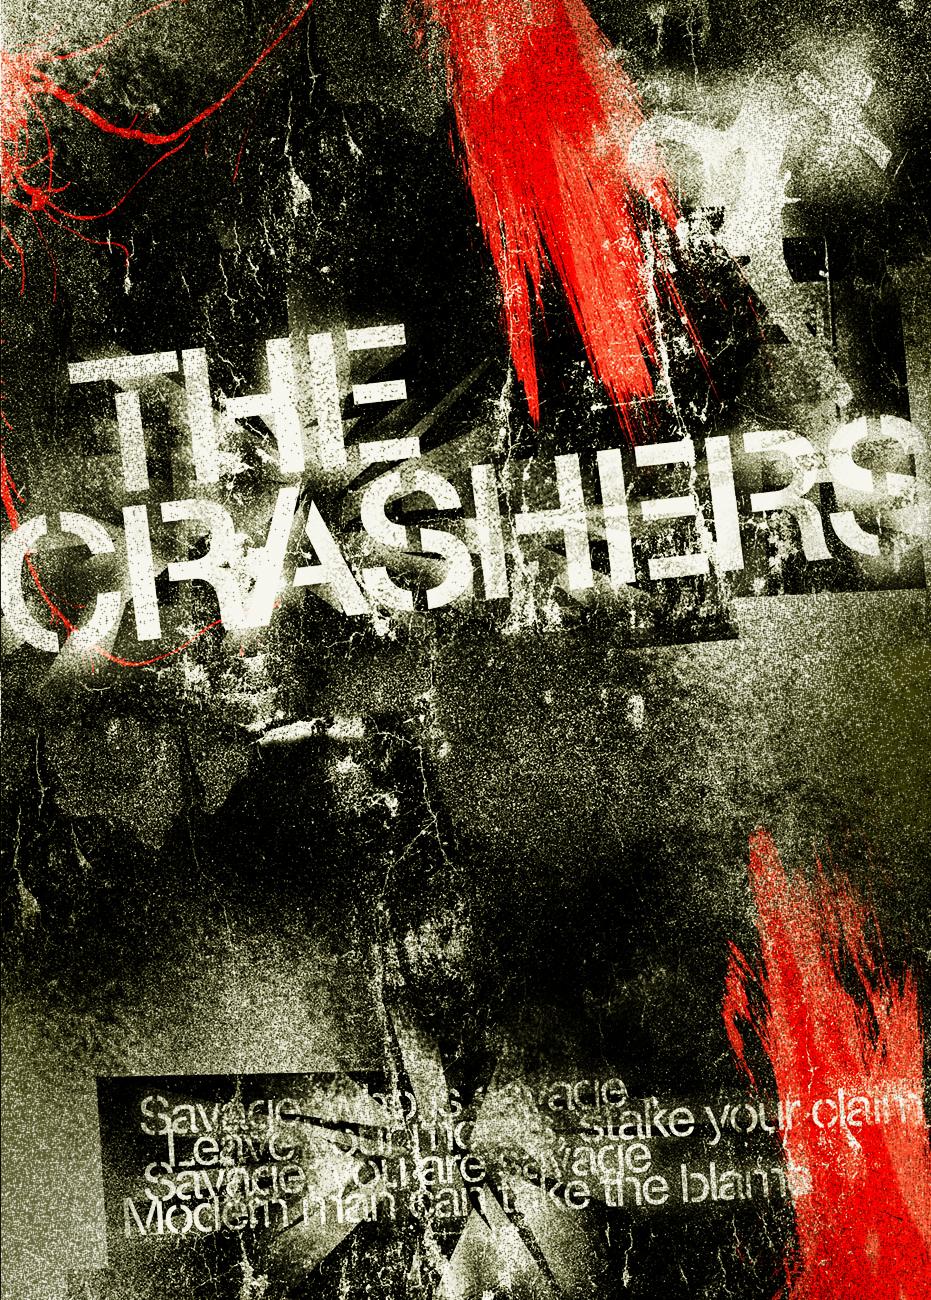 12 The CrashersB2.jpg